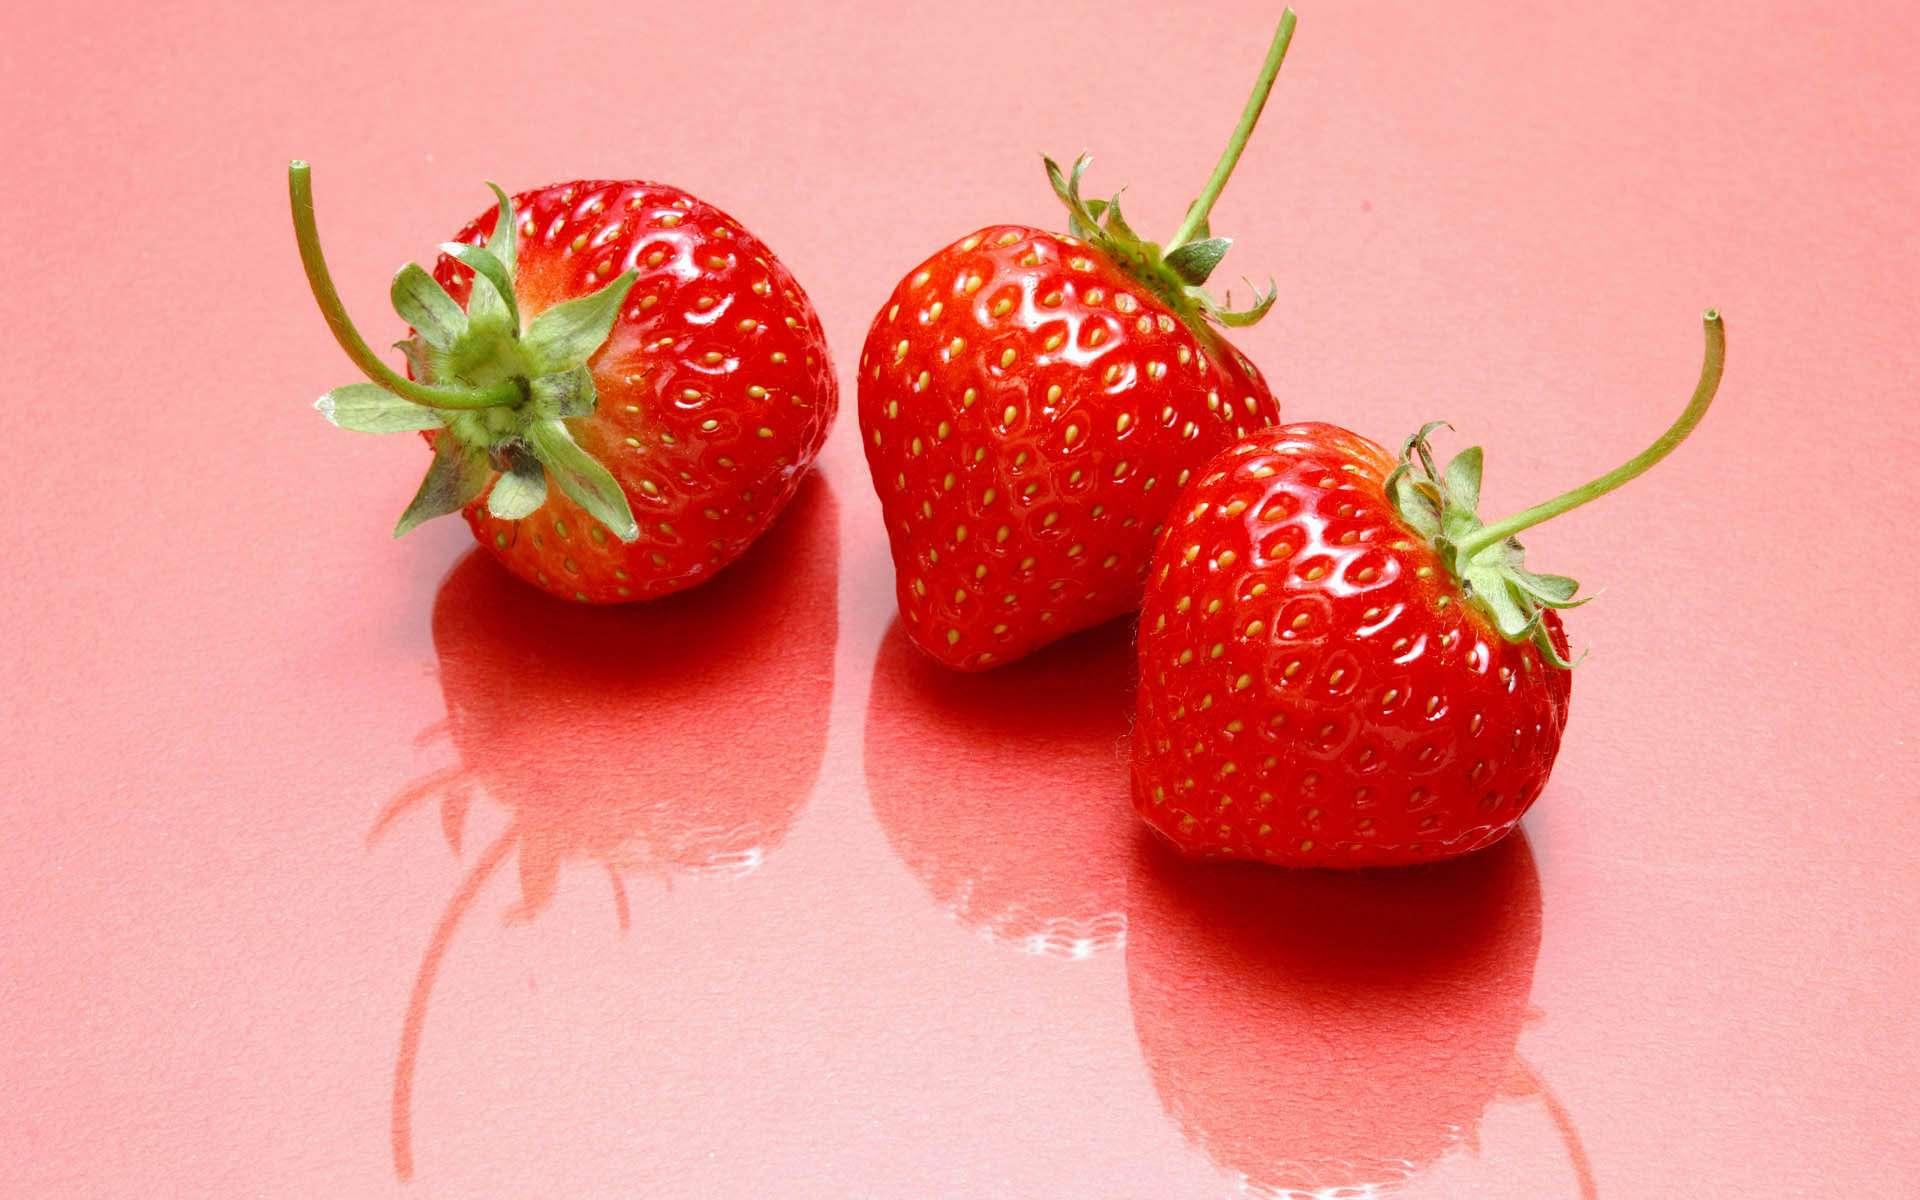 strawberry reflection desktop wallpaper 62425